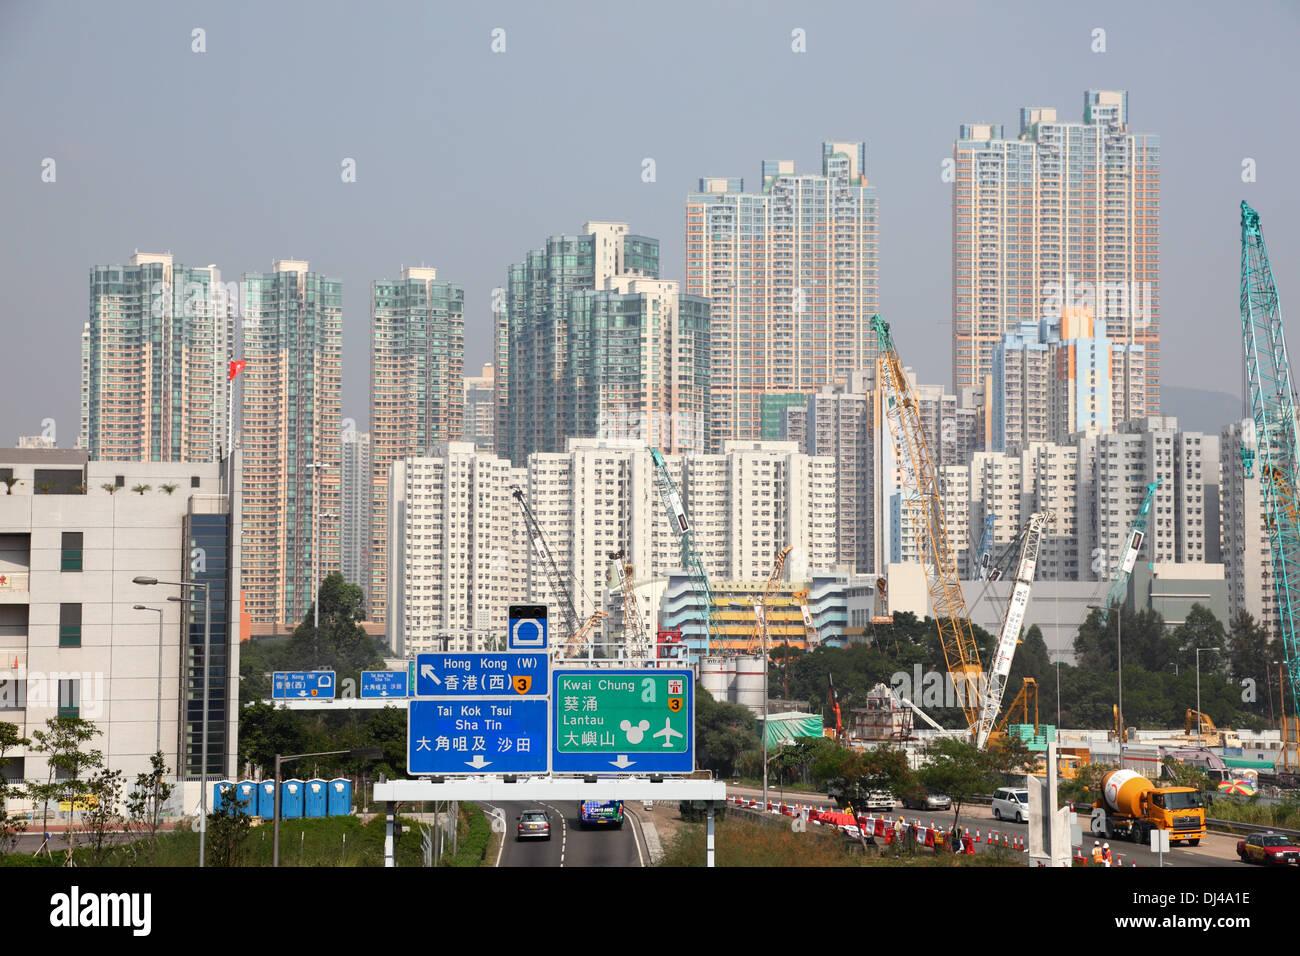 Highrise buildings in Hong Kong Sha Tin - Stock Image